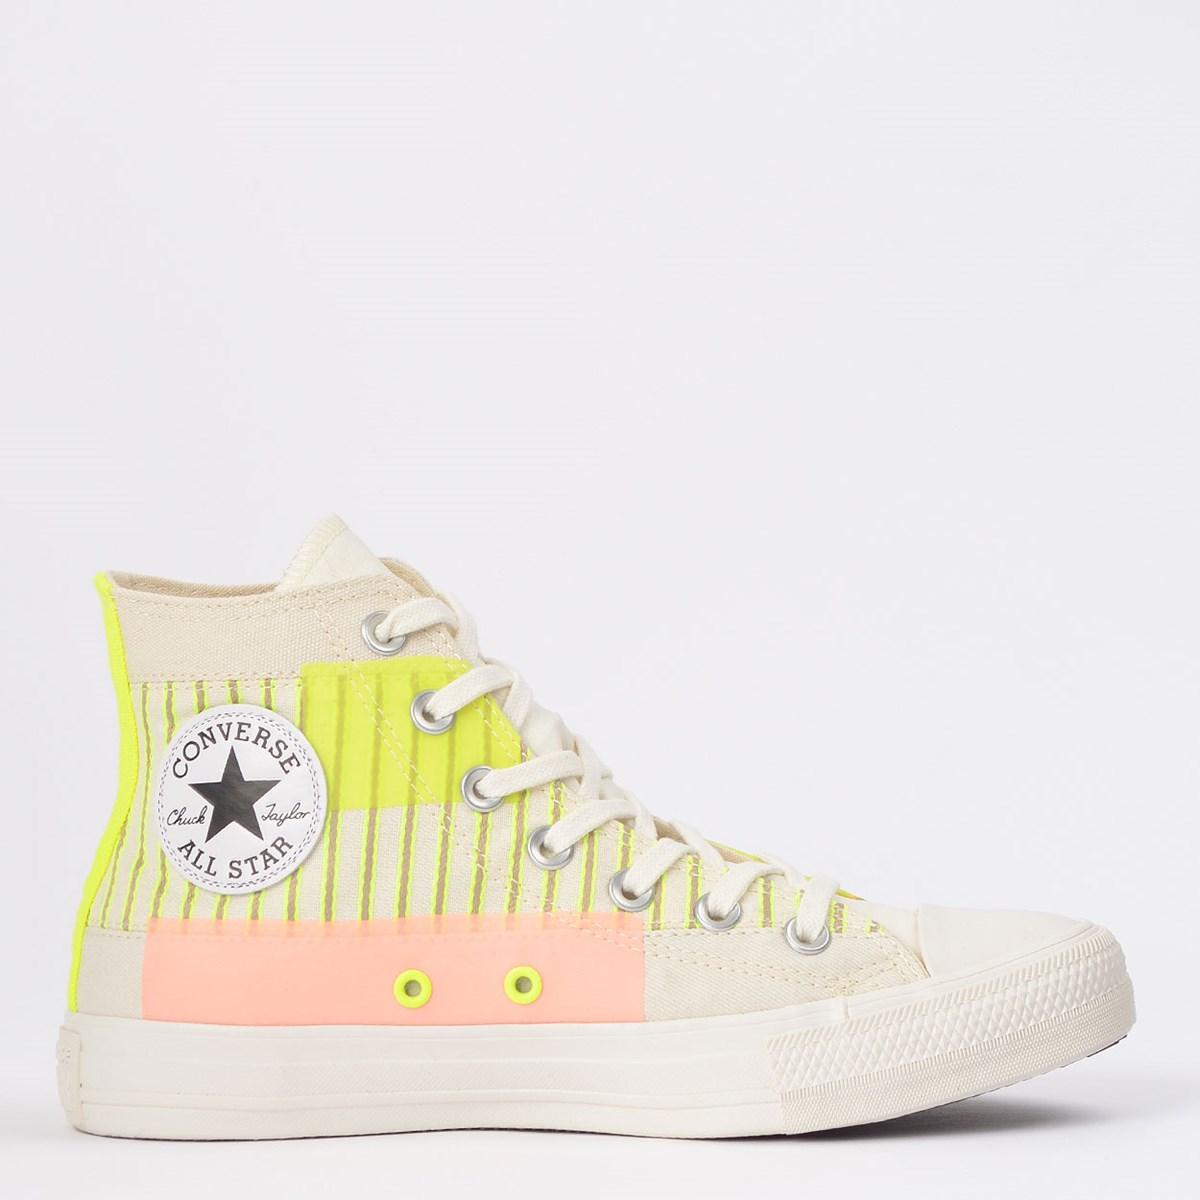 Tênis Converse Chuck Taylor All Star Hi Bege Claro Verde Fluor CT14840001